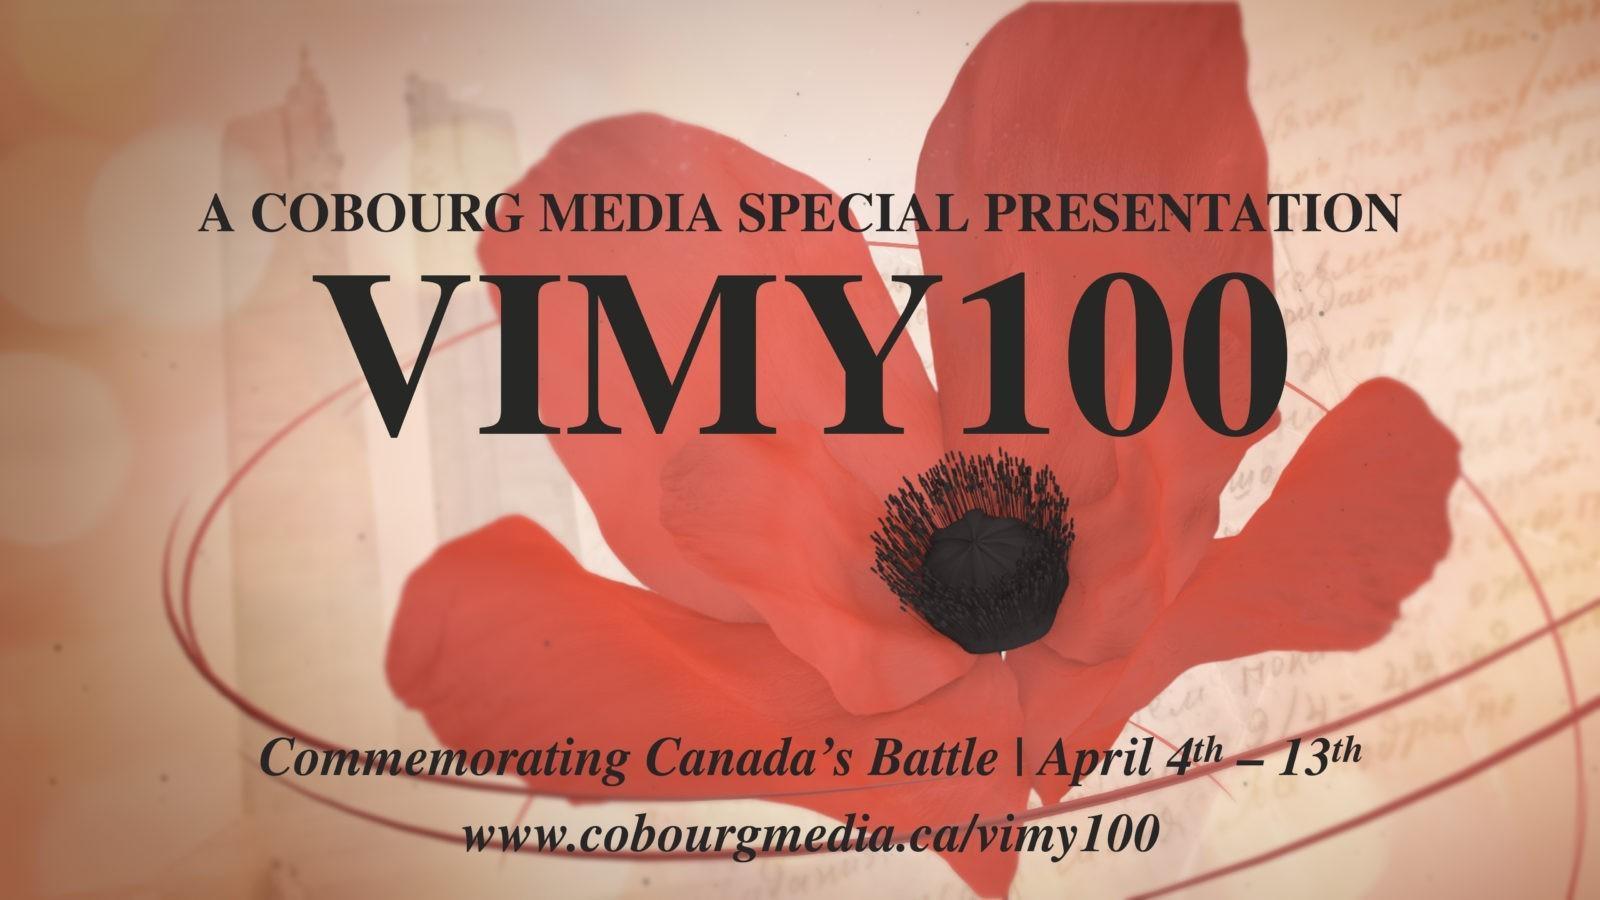 Vimy100- Commemorating Canada's Battle